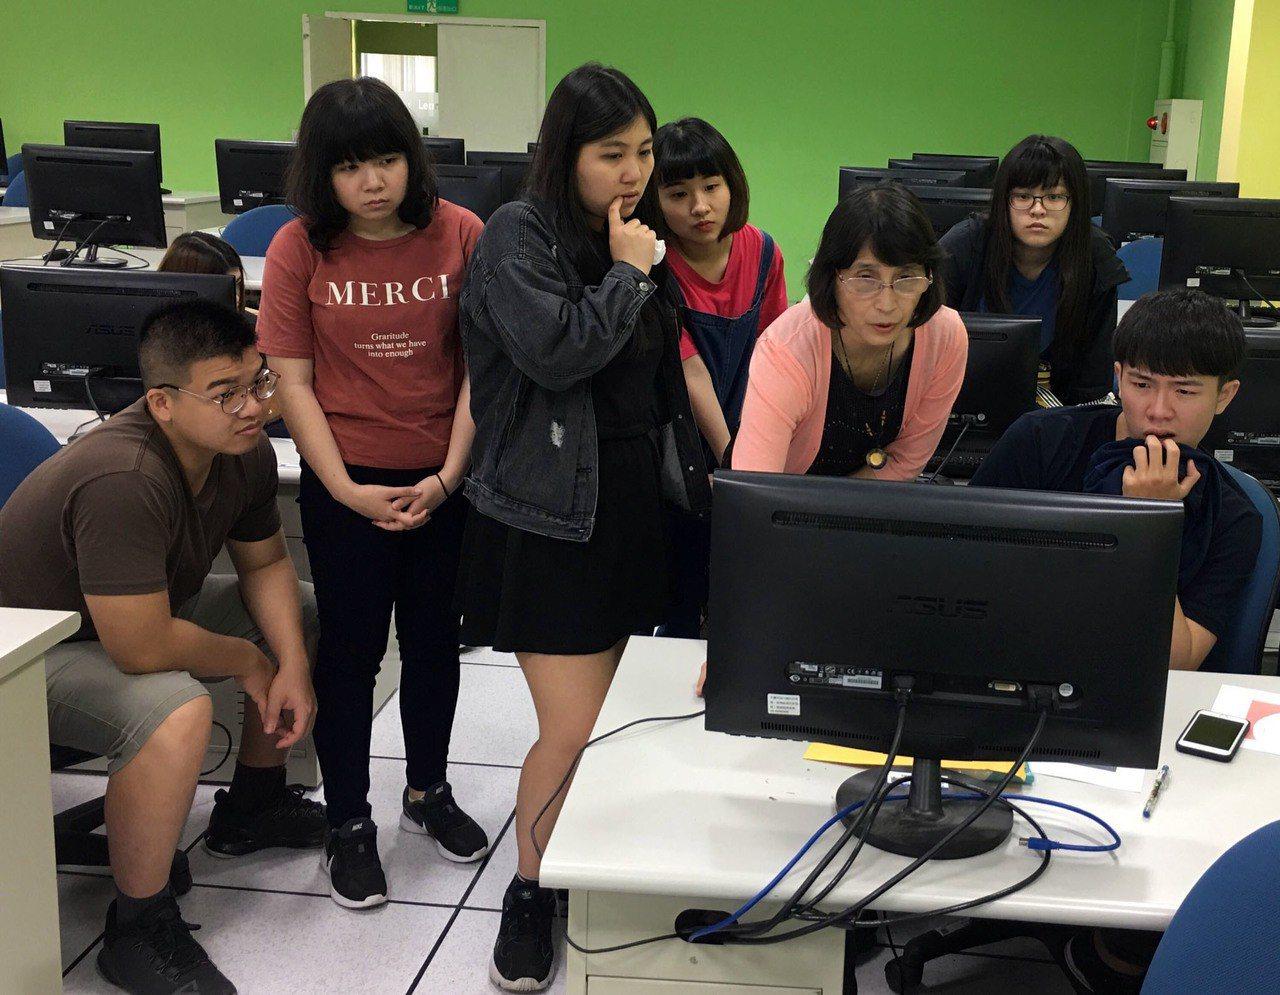 AI人工智慧快速蓬勃發展,龍華科技大學近年來積極運用AI、物聯網及雲端科技輔助教...